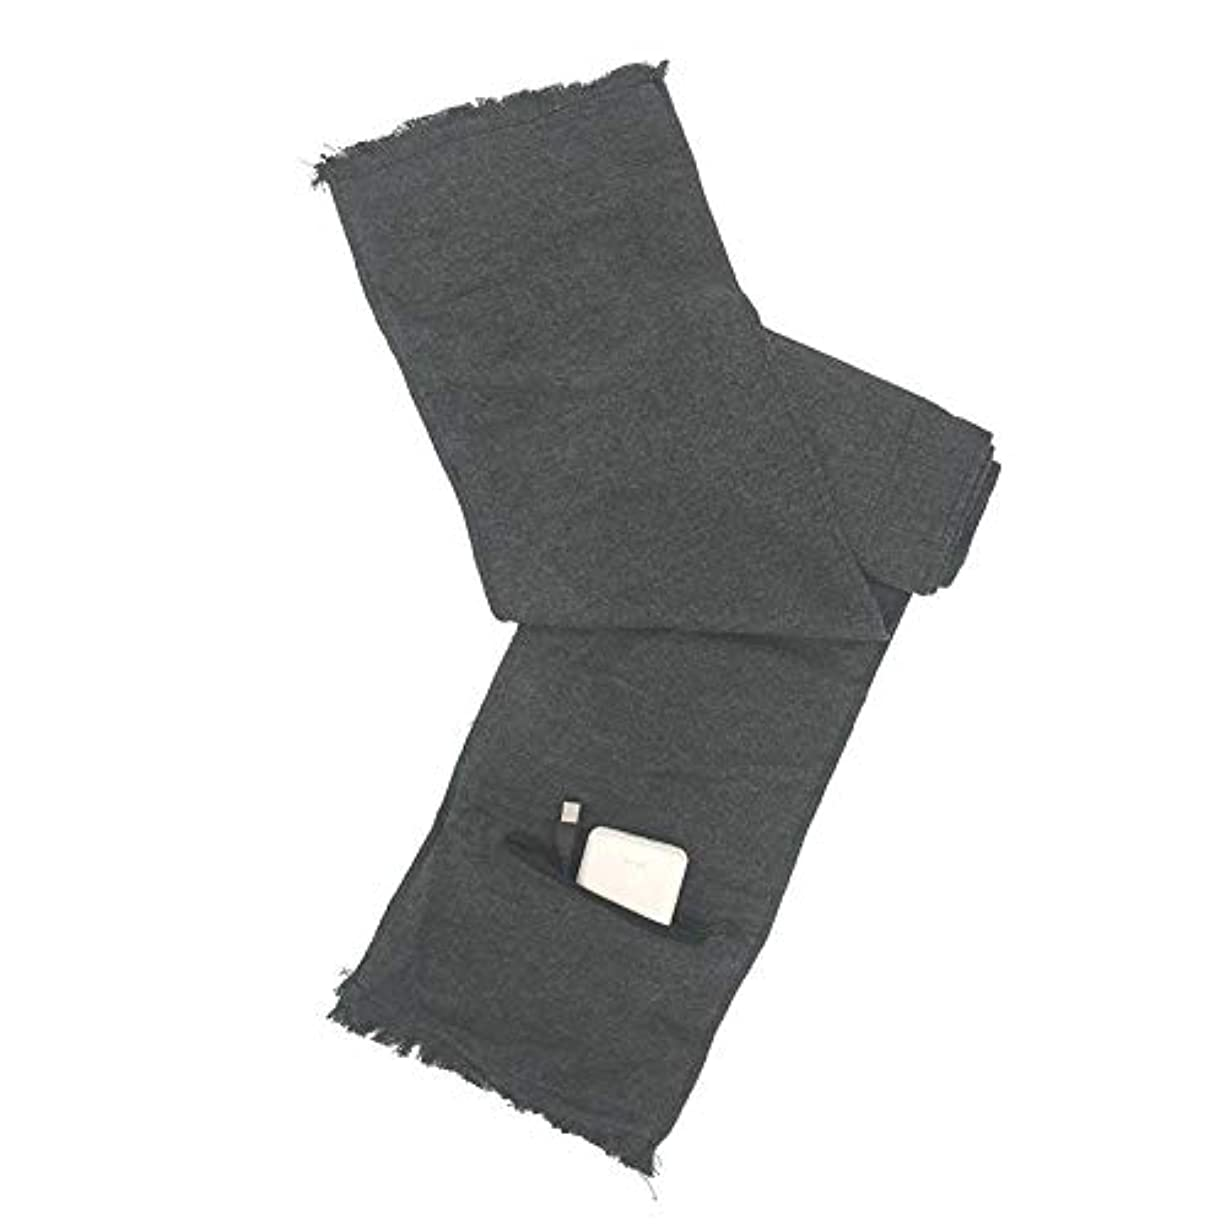 Sund 電気加熱マフラー 冬用 加熱スカーフ USB充電式 遠赤外線 発熱効果 男女兼用 通勤通学 室外作業